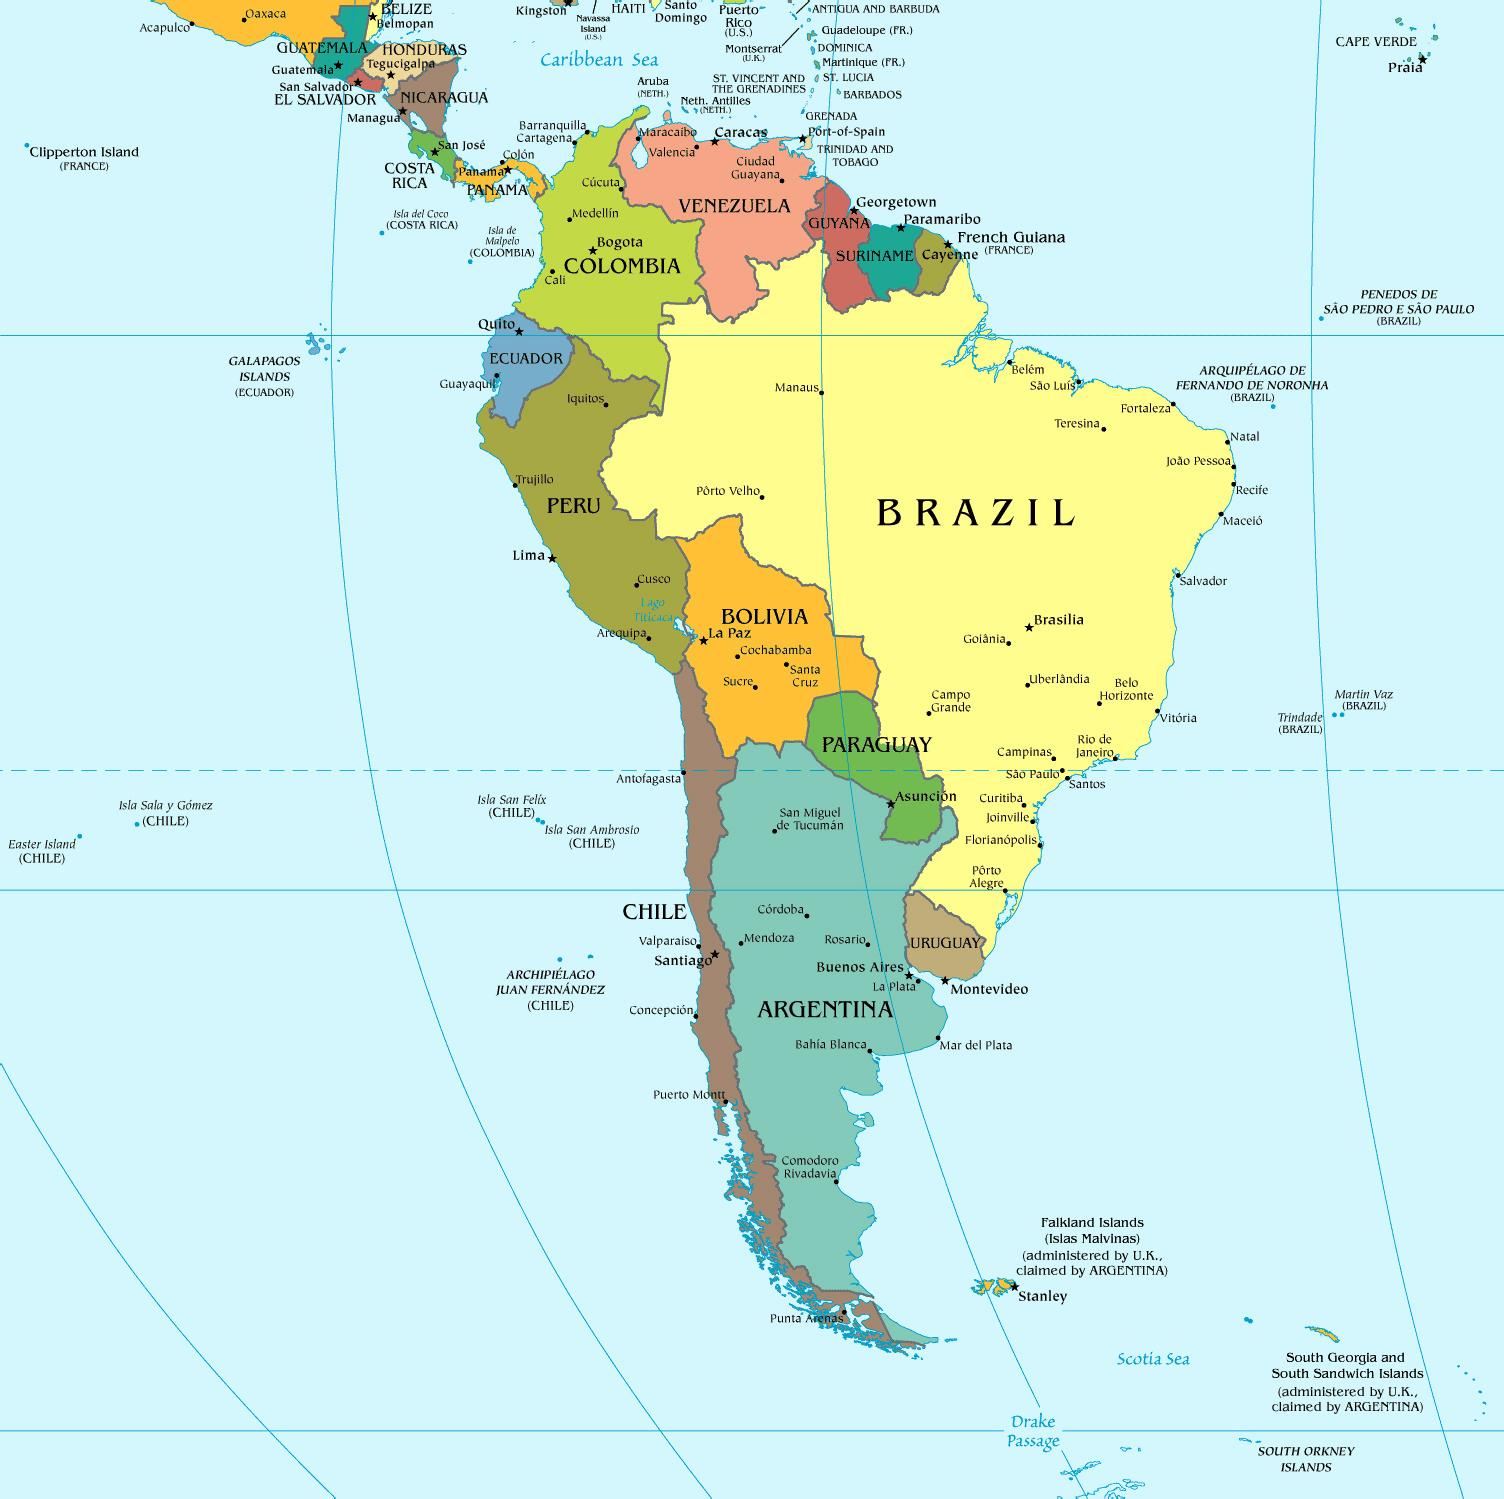 South America political map South America Mapsland Maps of